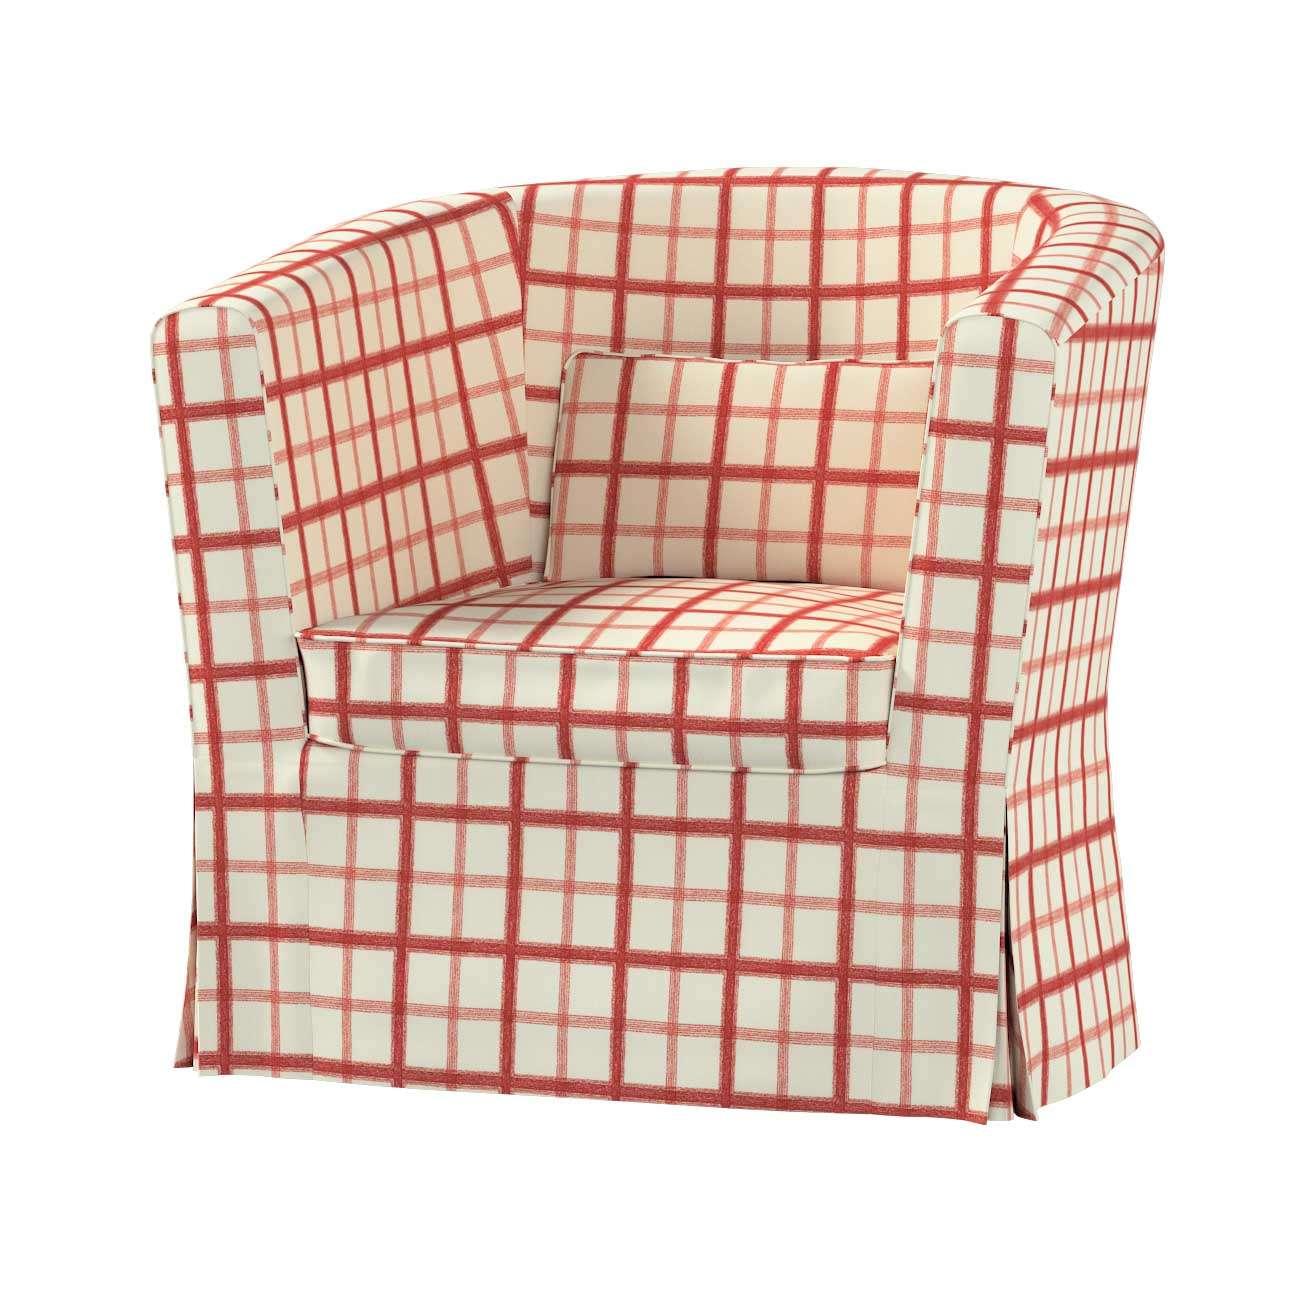 Pokrowiec na fotel Ektorp Tullsta fotel Ektorp Tullsta w kolekcji Avinon, tkanina: 131-15